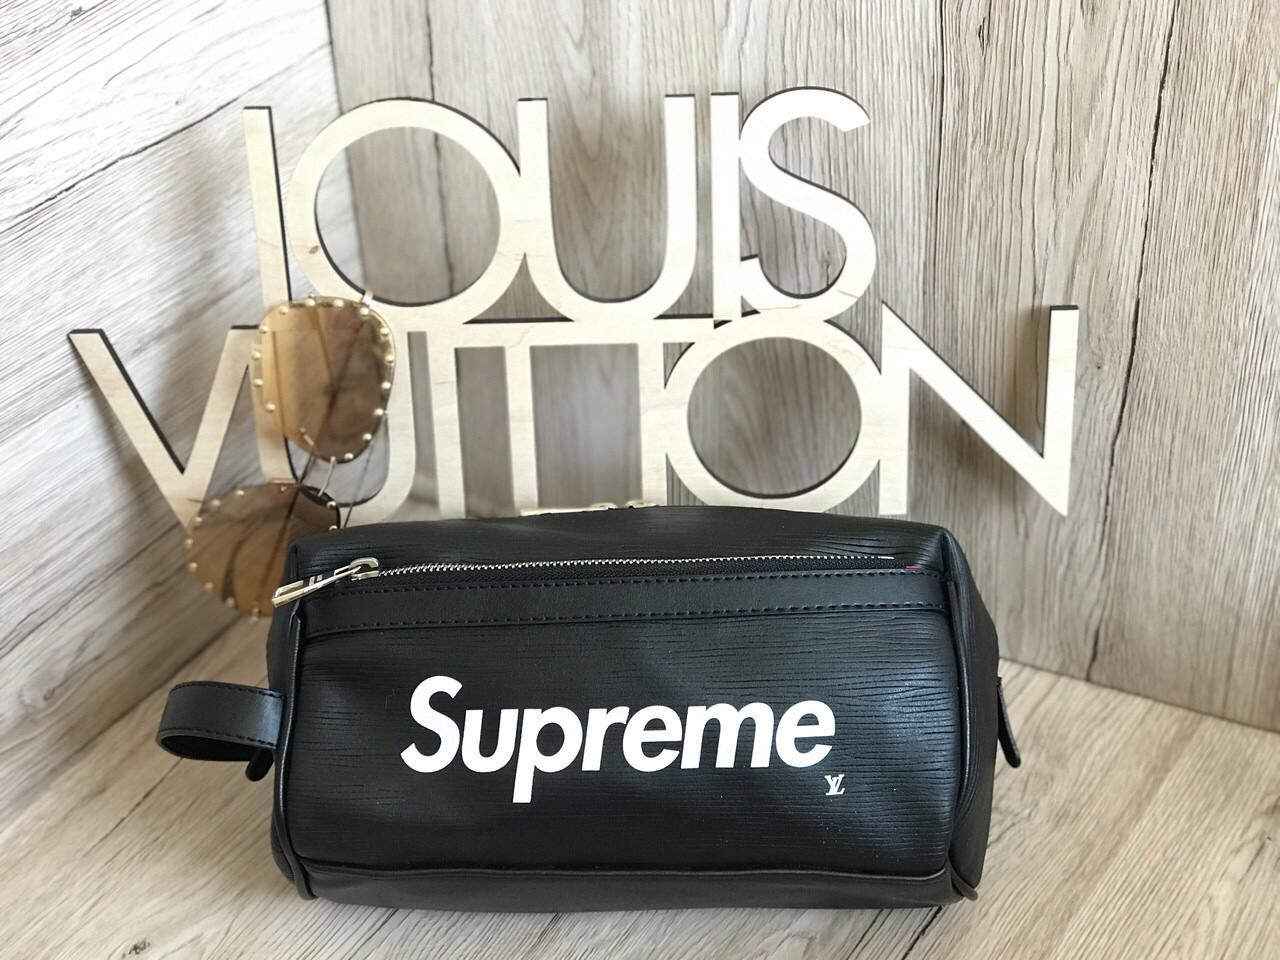 83a81df93248 Мужская барсетка в стиле Louis Vuitton LV Supreme black: продажа ...